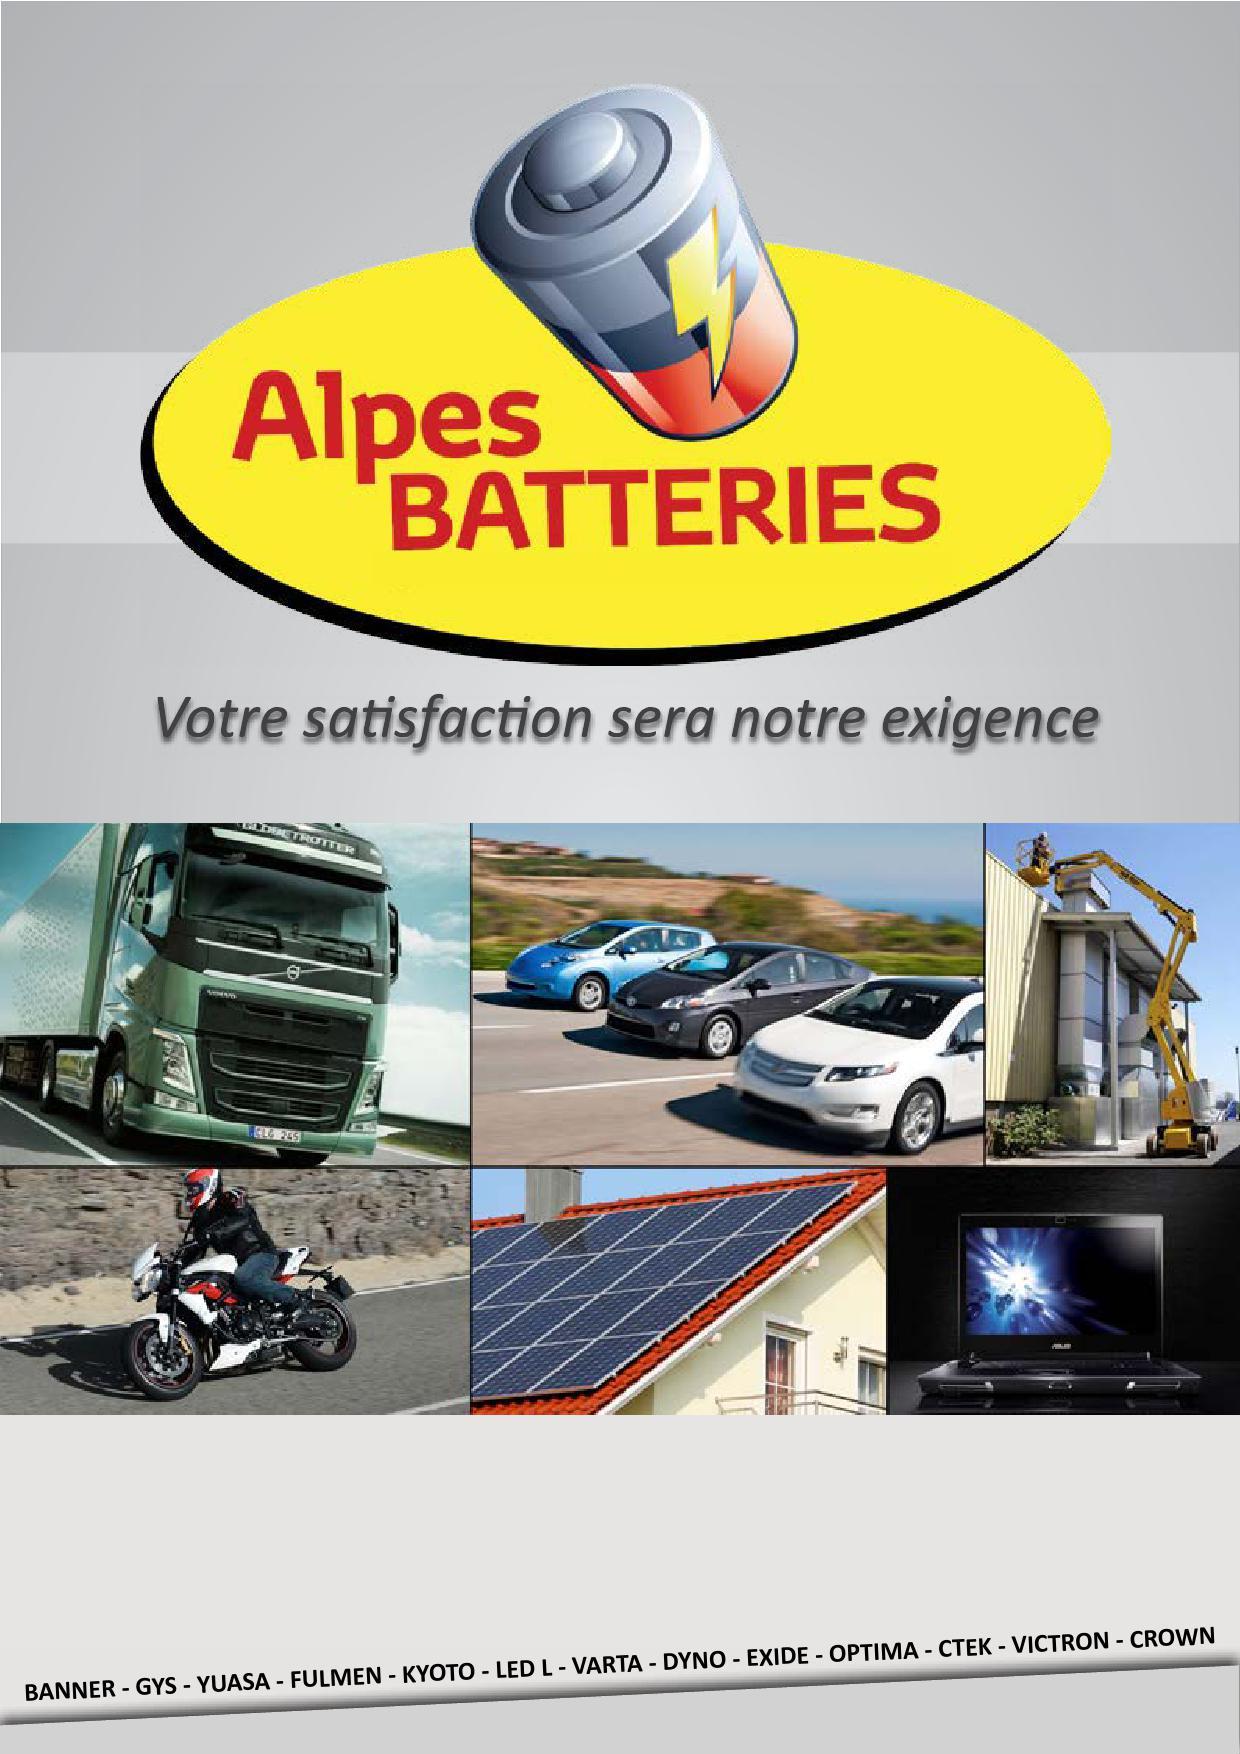 alpes batterie_000001